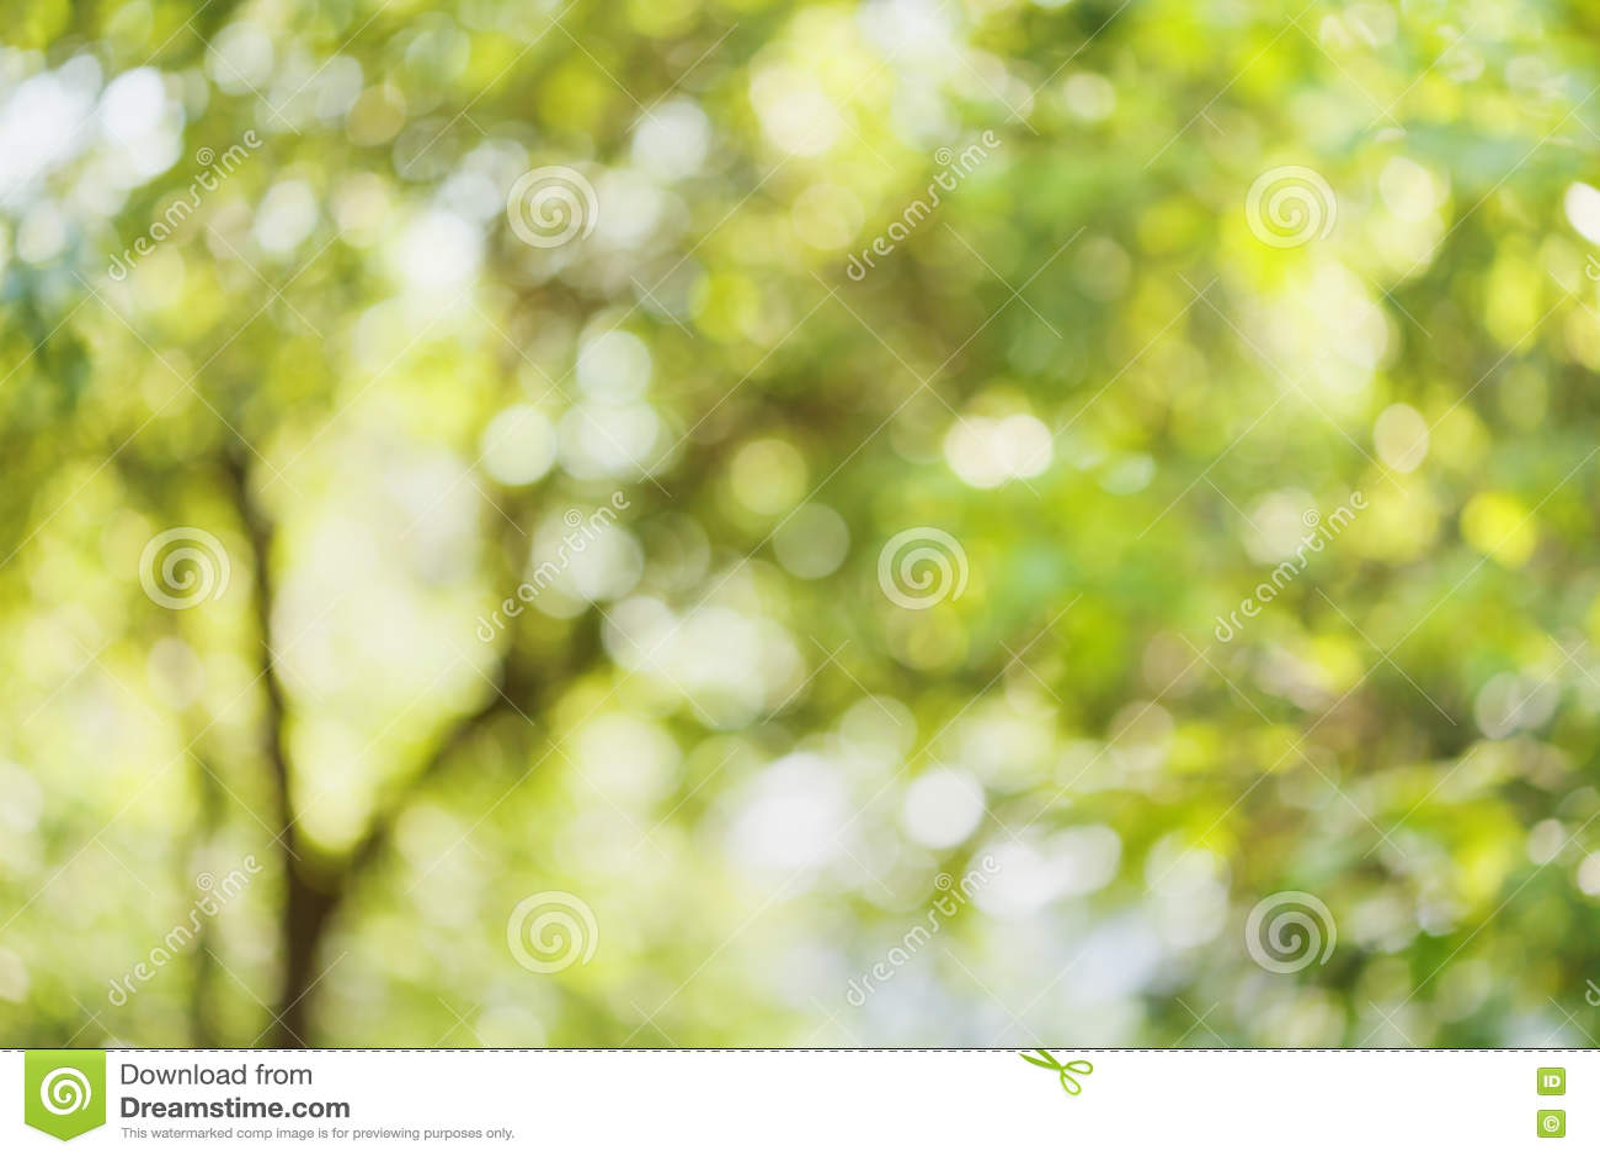 Defocused树美好的bokeh背景  绿色叶子自然被弄脏的背景  夏天或春季